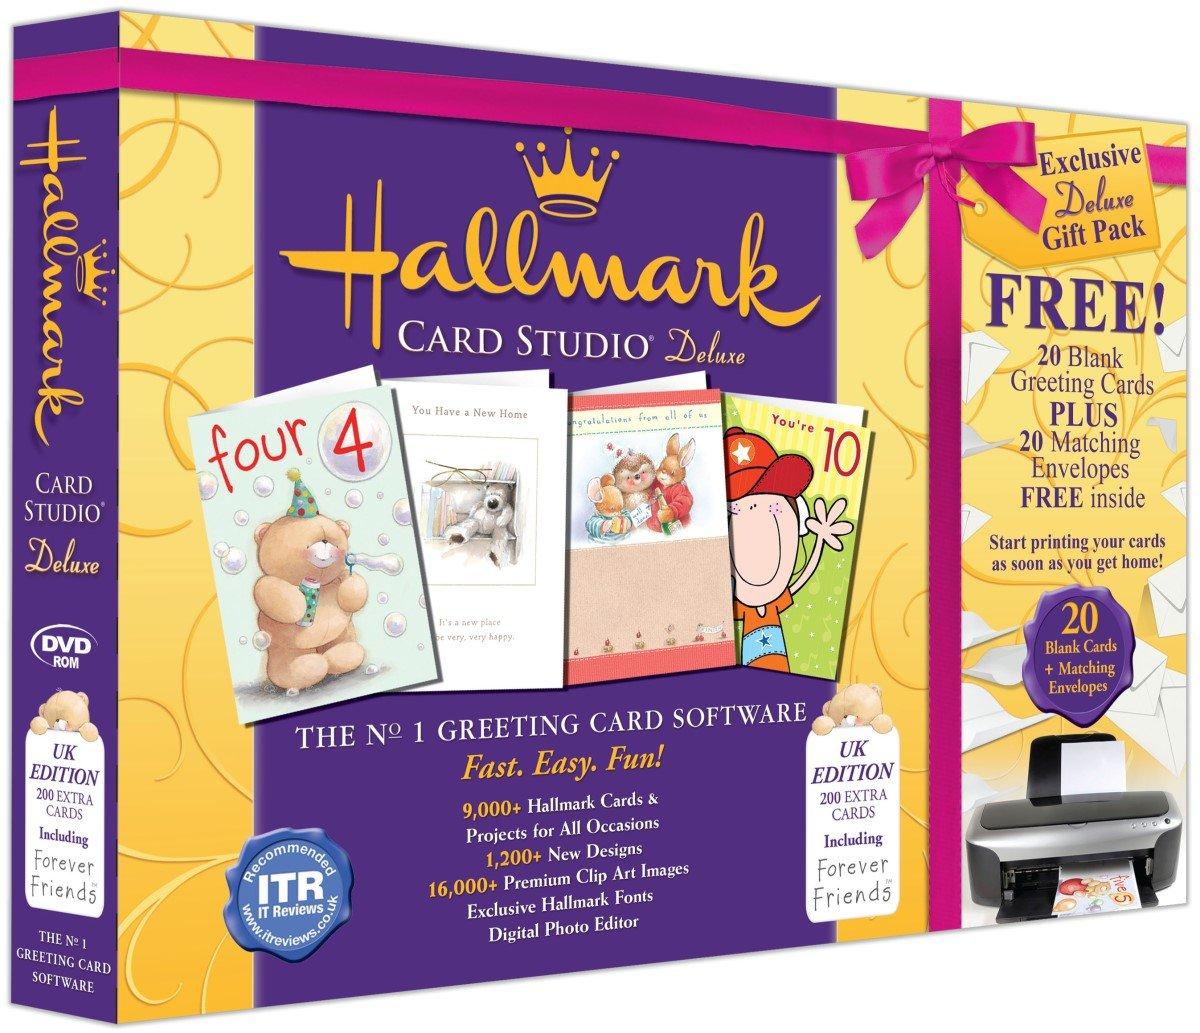 Hallmark Card Studio Deluxe Gift Pack PC DVD Amazoncouk Software – Hallmark Personalised Birthday Cards